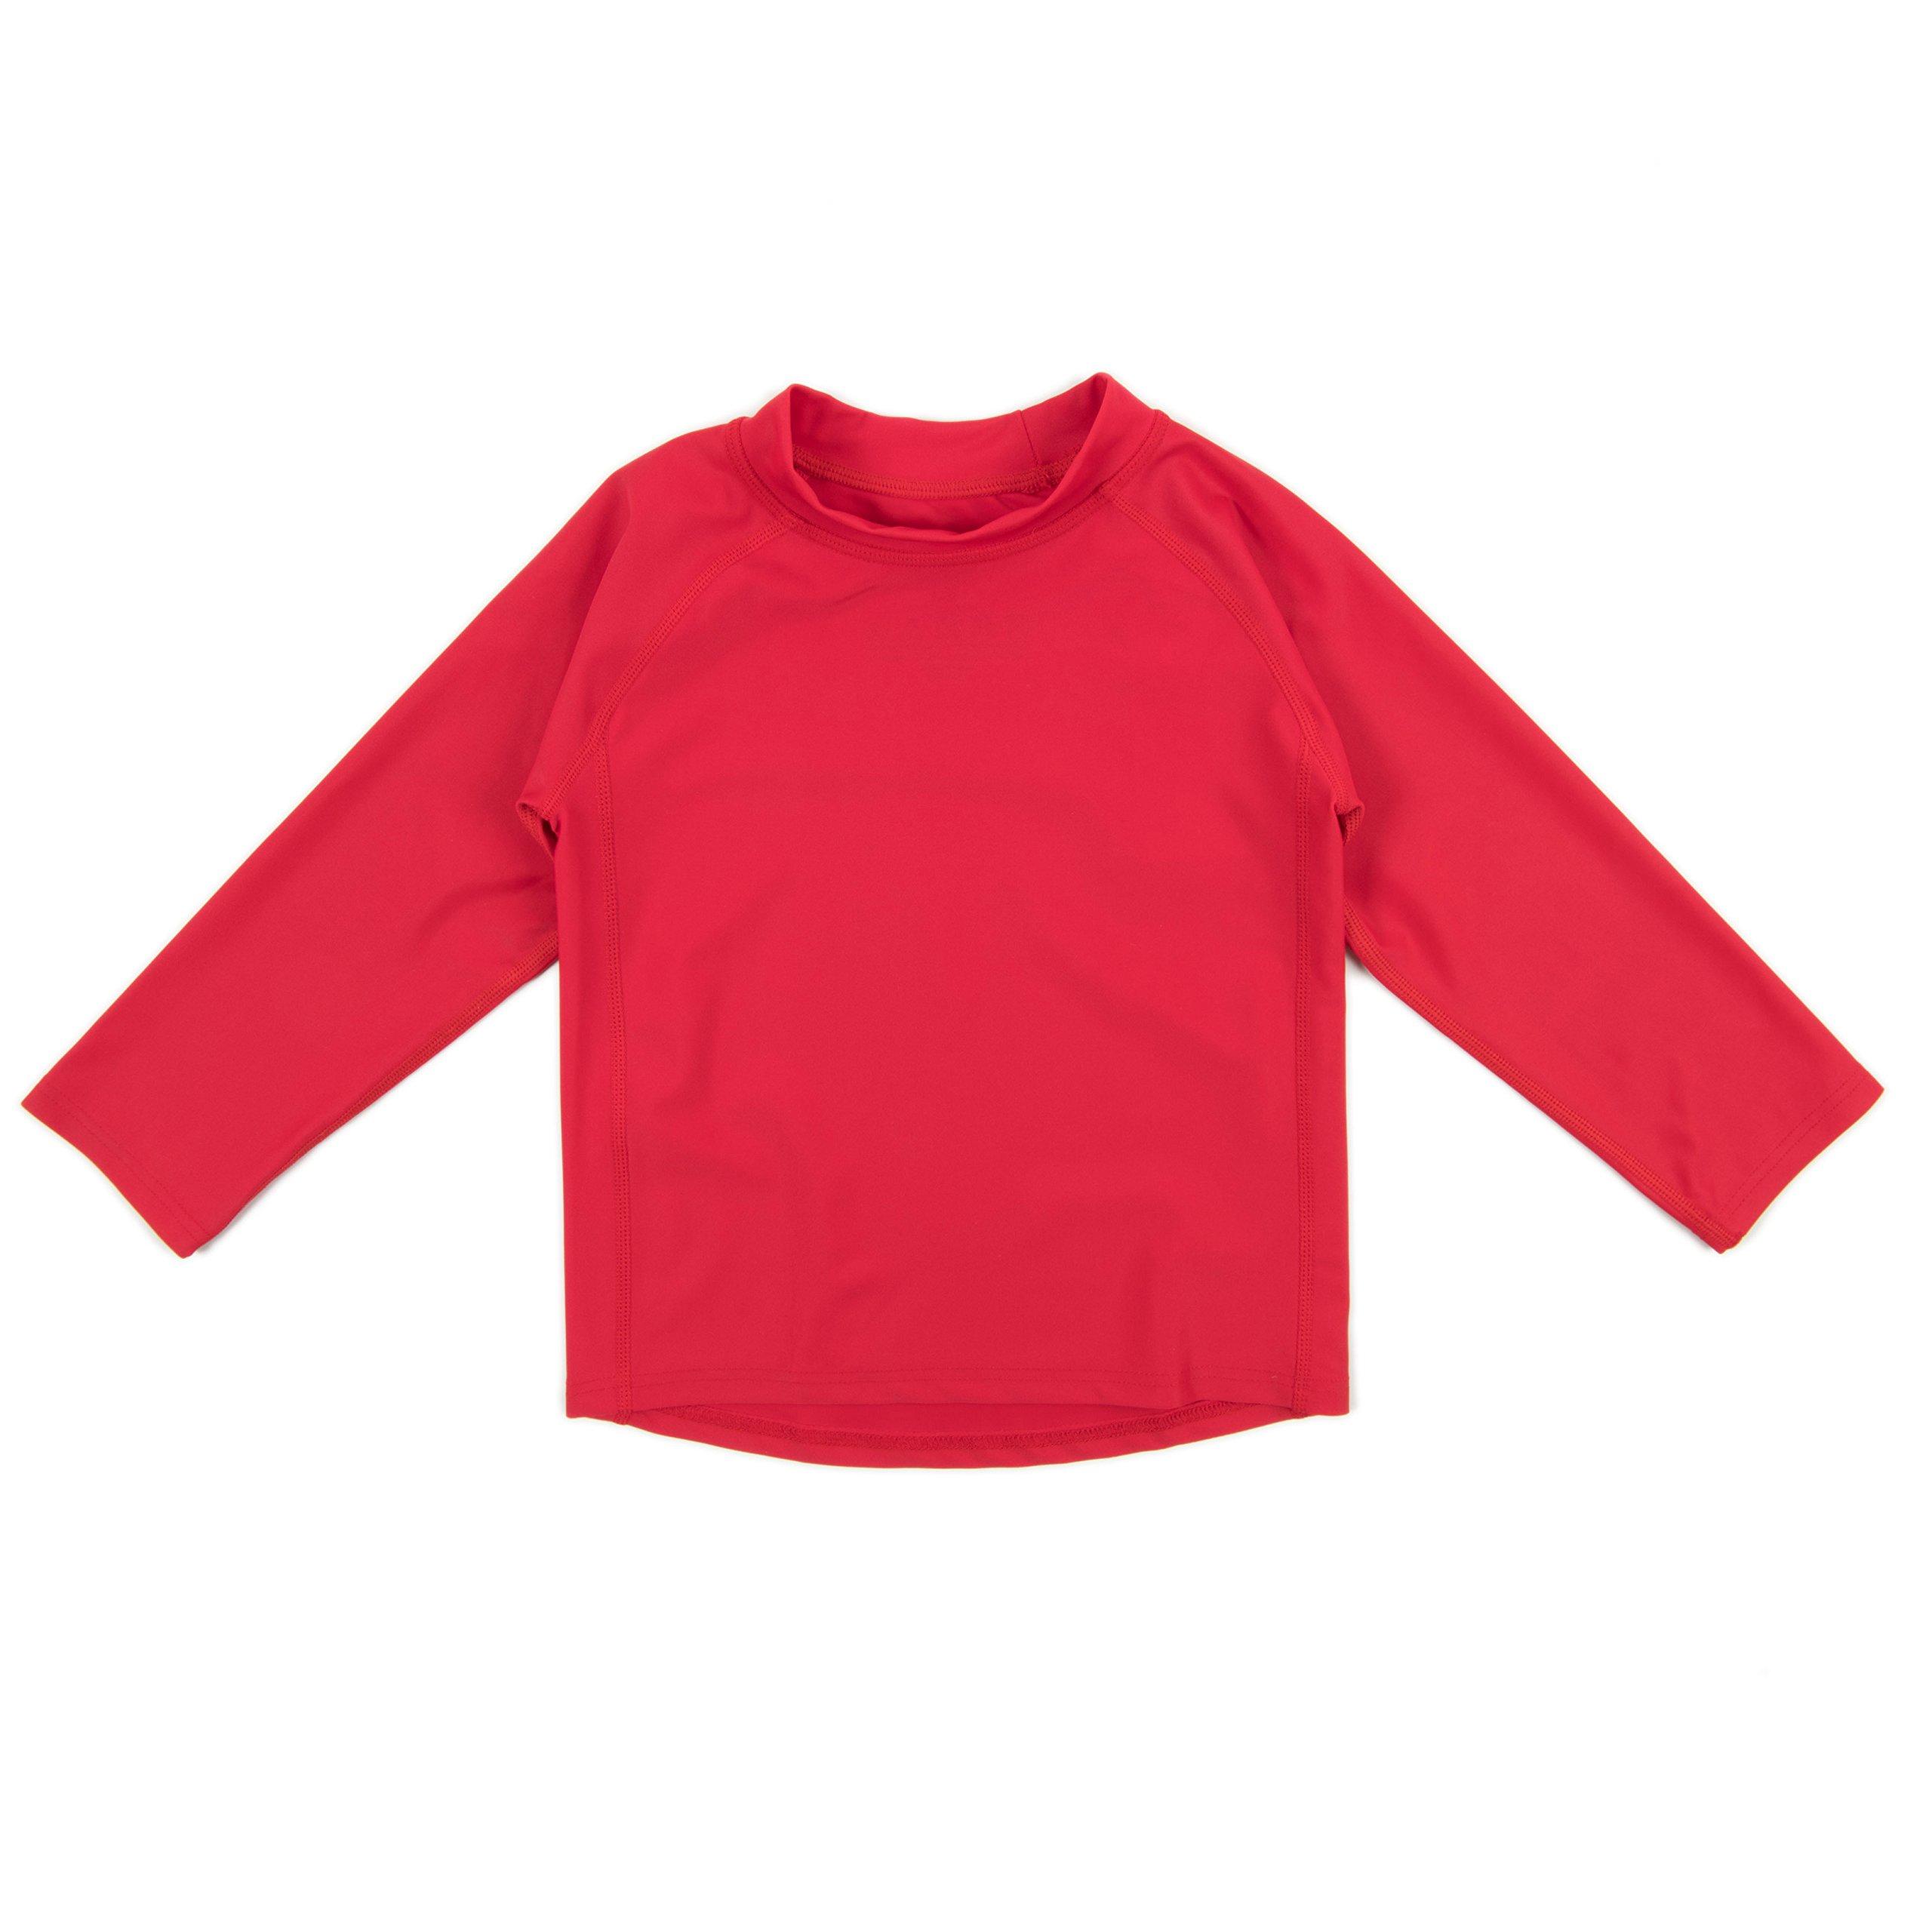 12M-5 Toddler Leveret Pink Short Sleeve Rash Guard Sun Protected UPF 50